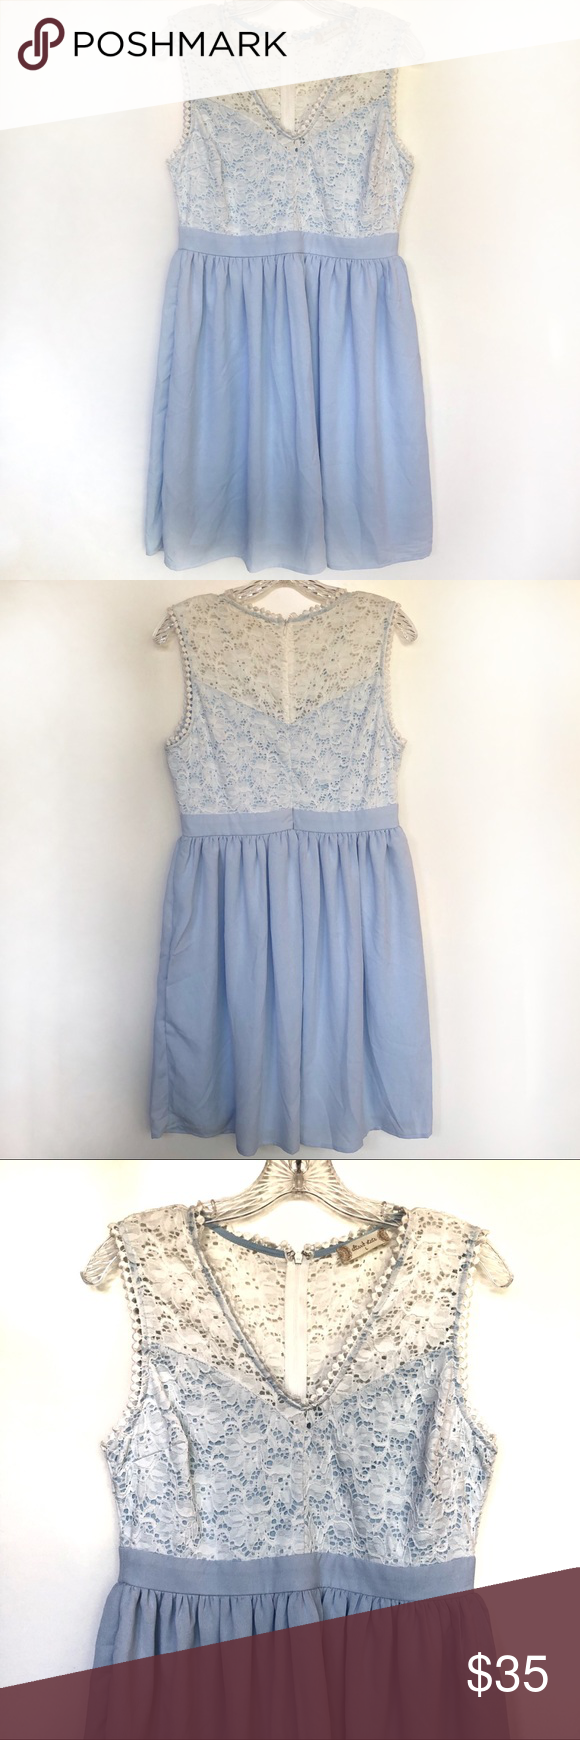 Altar D State Blue White Lace Dress Size L Lace White Dress Lace Top Dress White Lace Top Dress [ 1740 x 580 Pixel ]